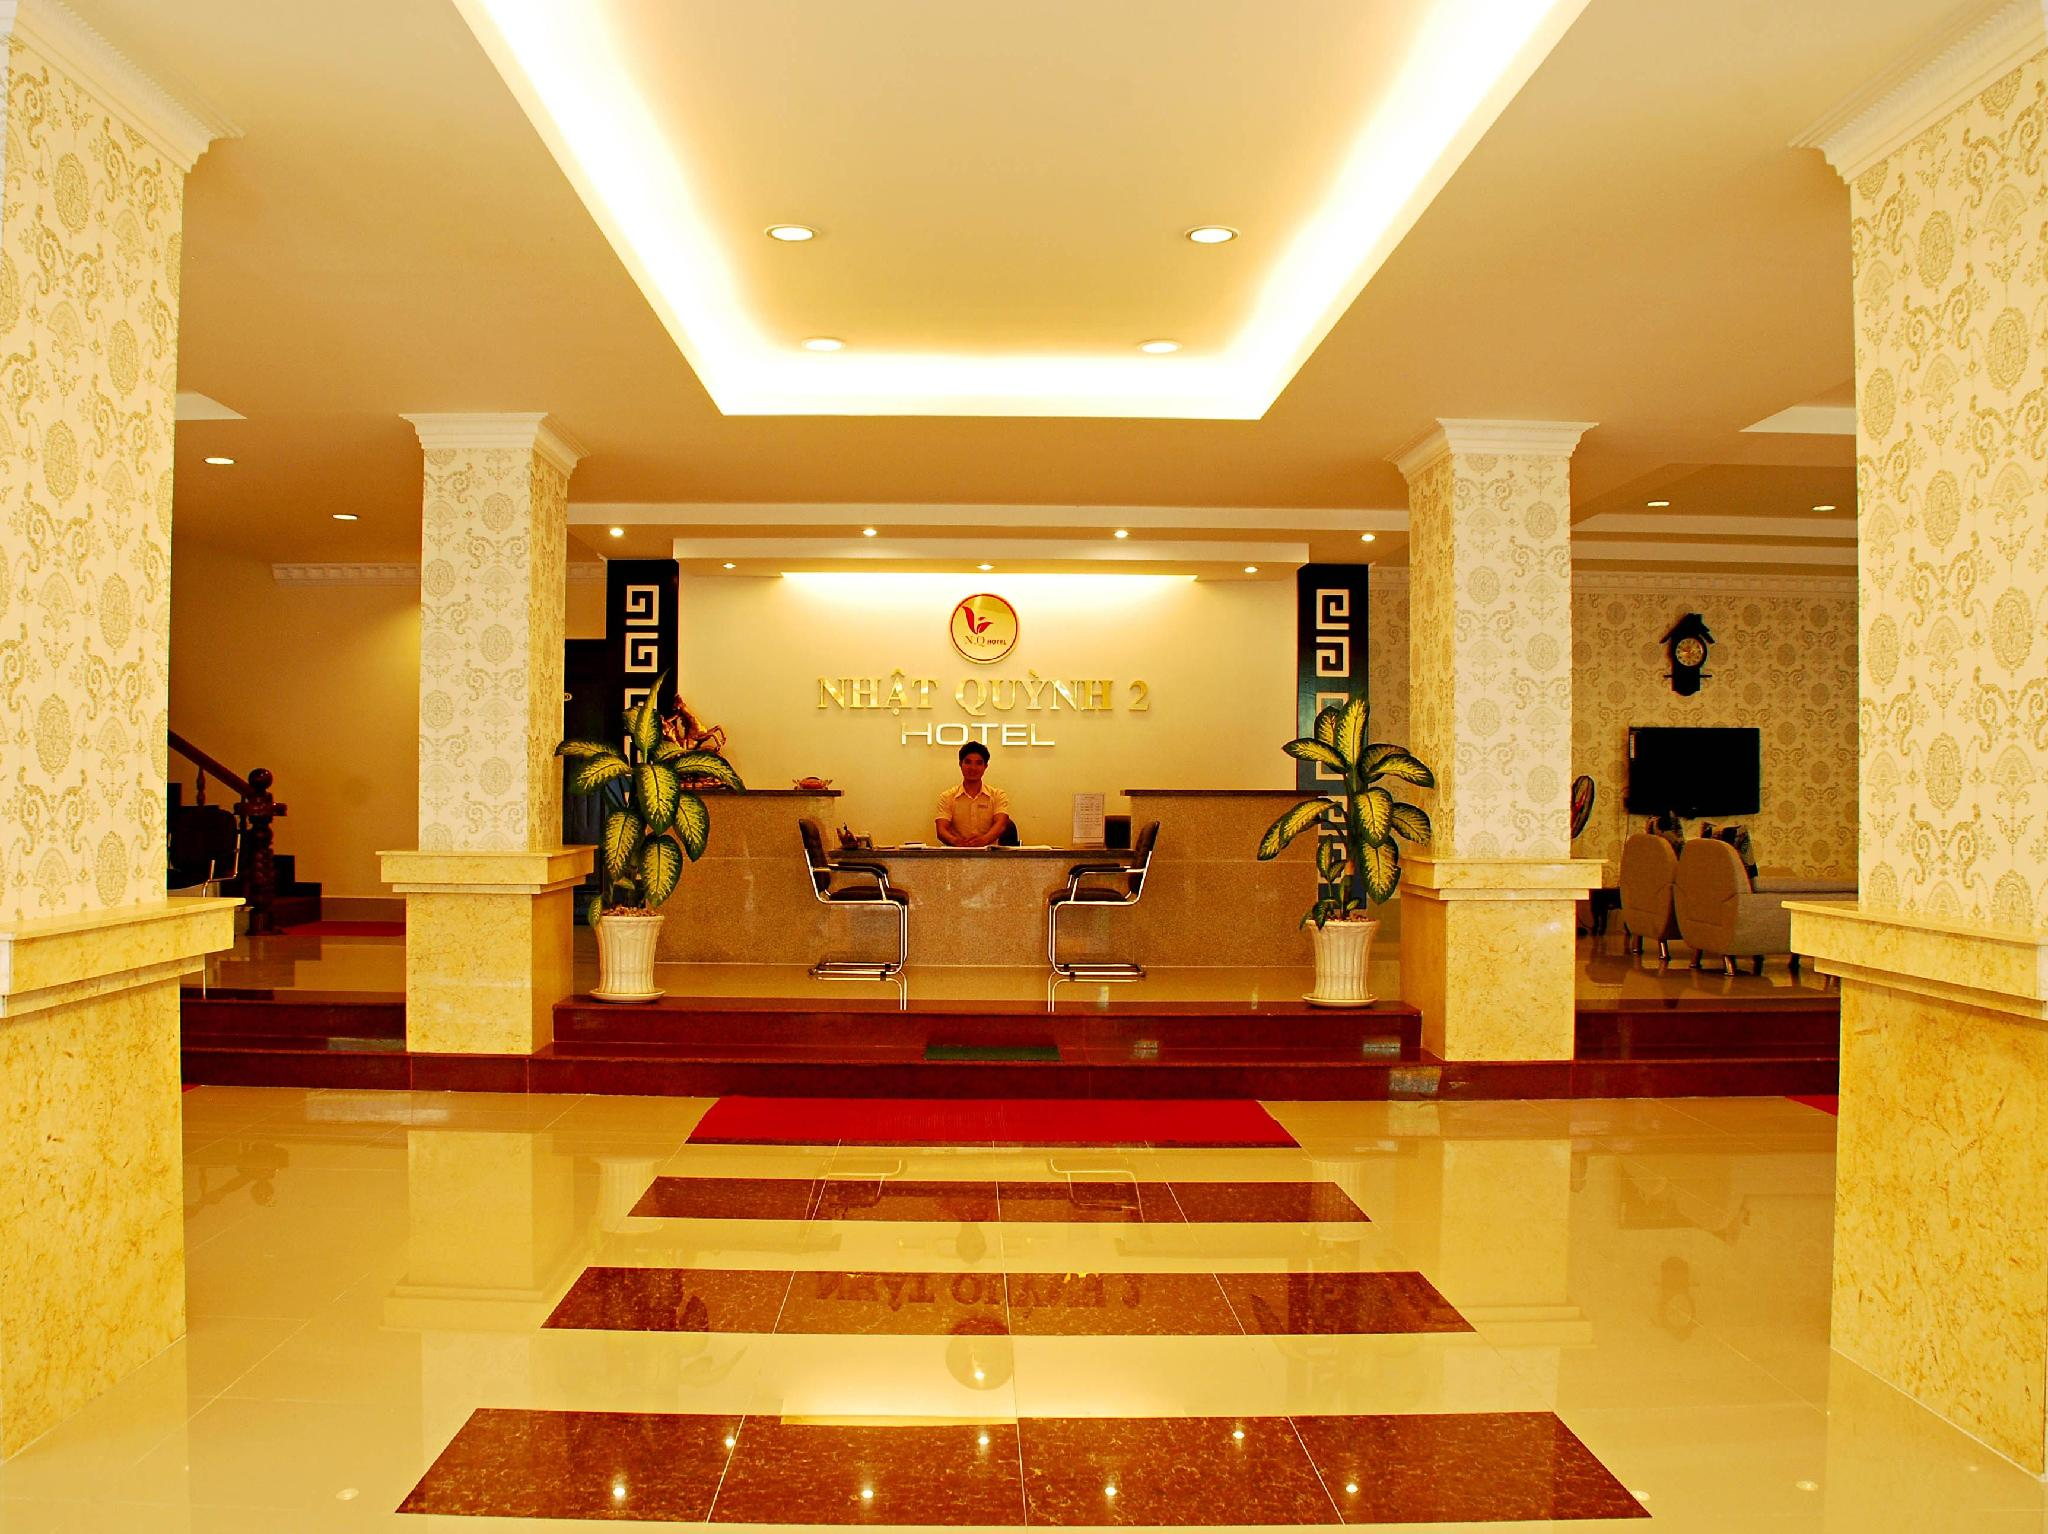 Nhat Quynh Hotel 2 - Hotell och Boende i Vietnam , Rach Gia (Kien Giang)